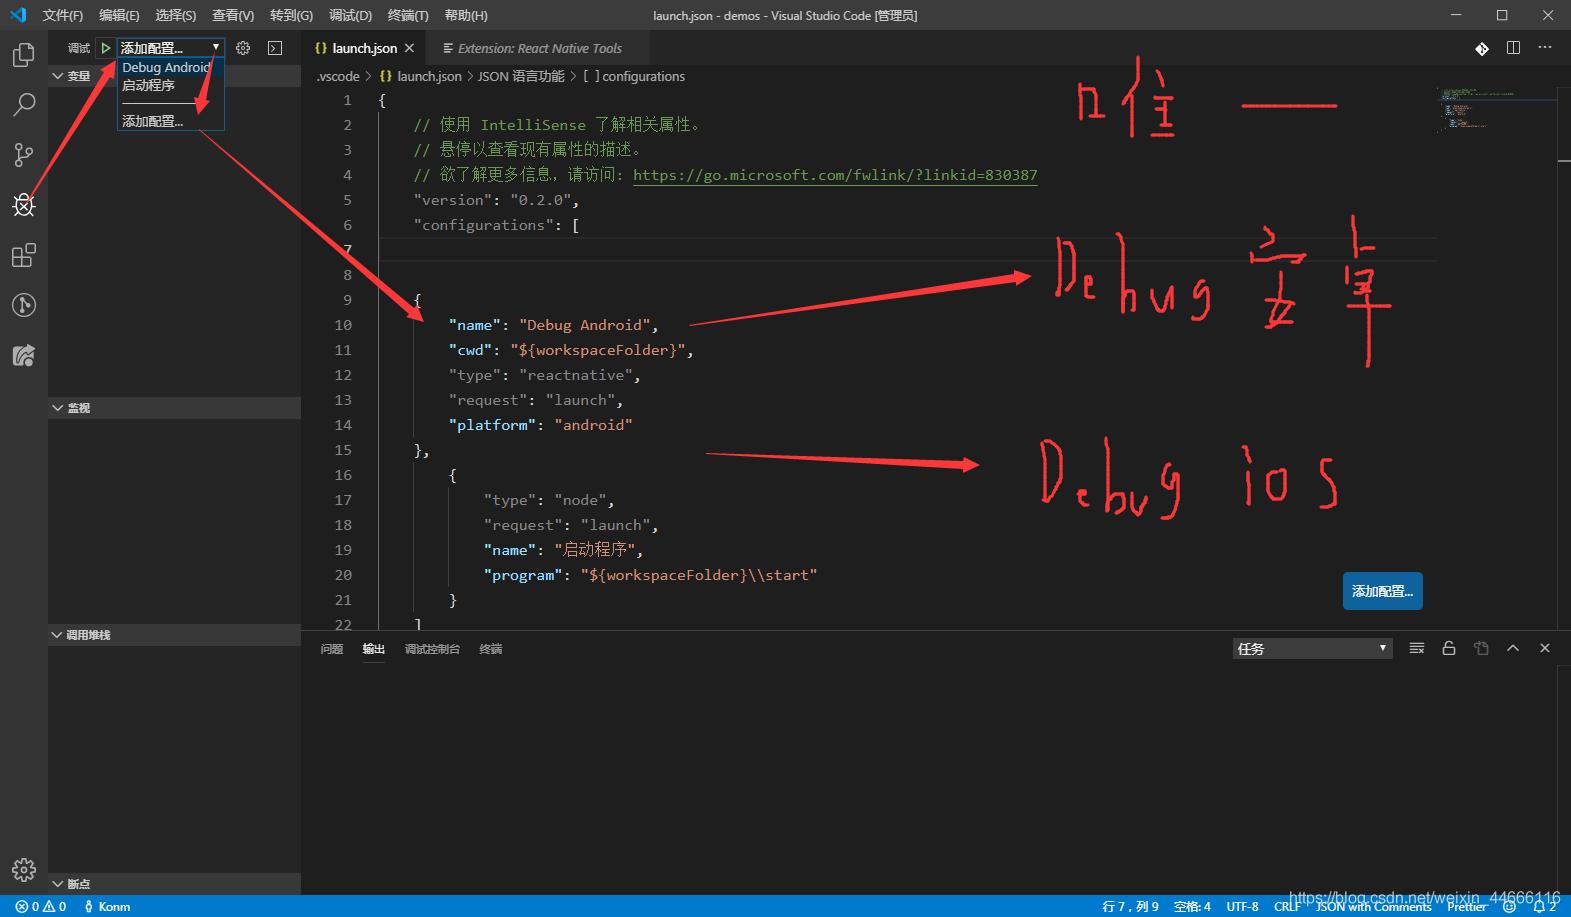 打开 debug 模式  **添加配置**